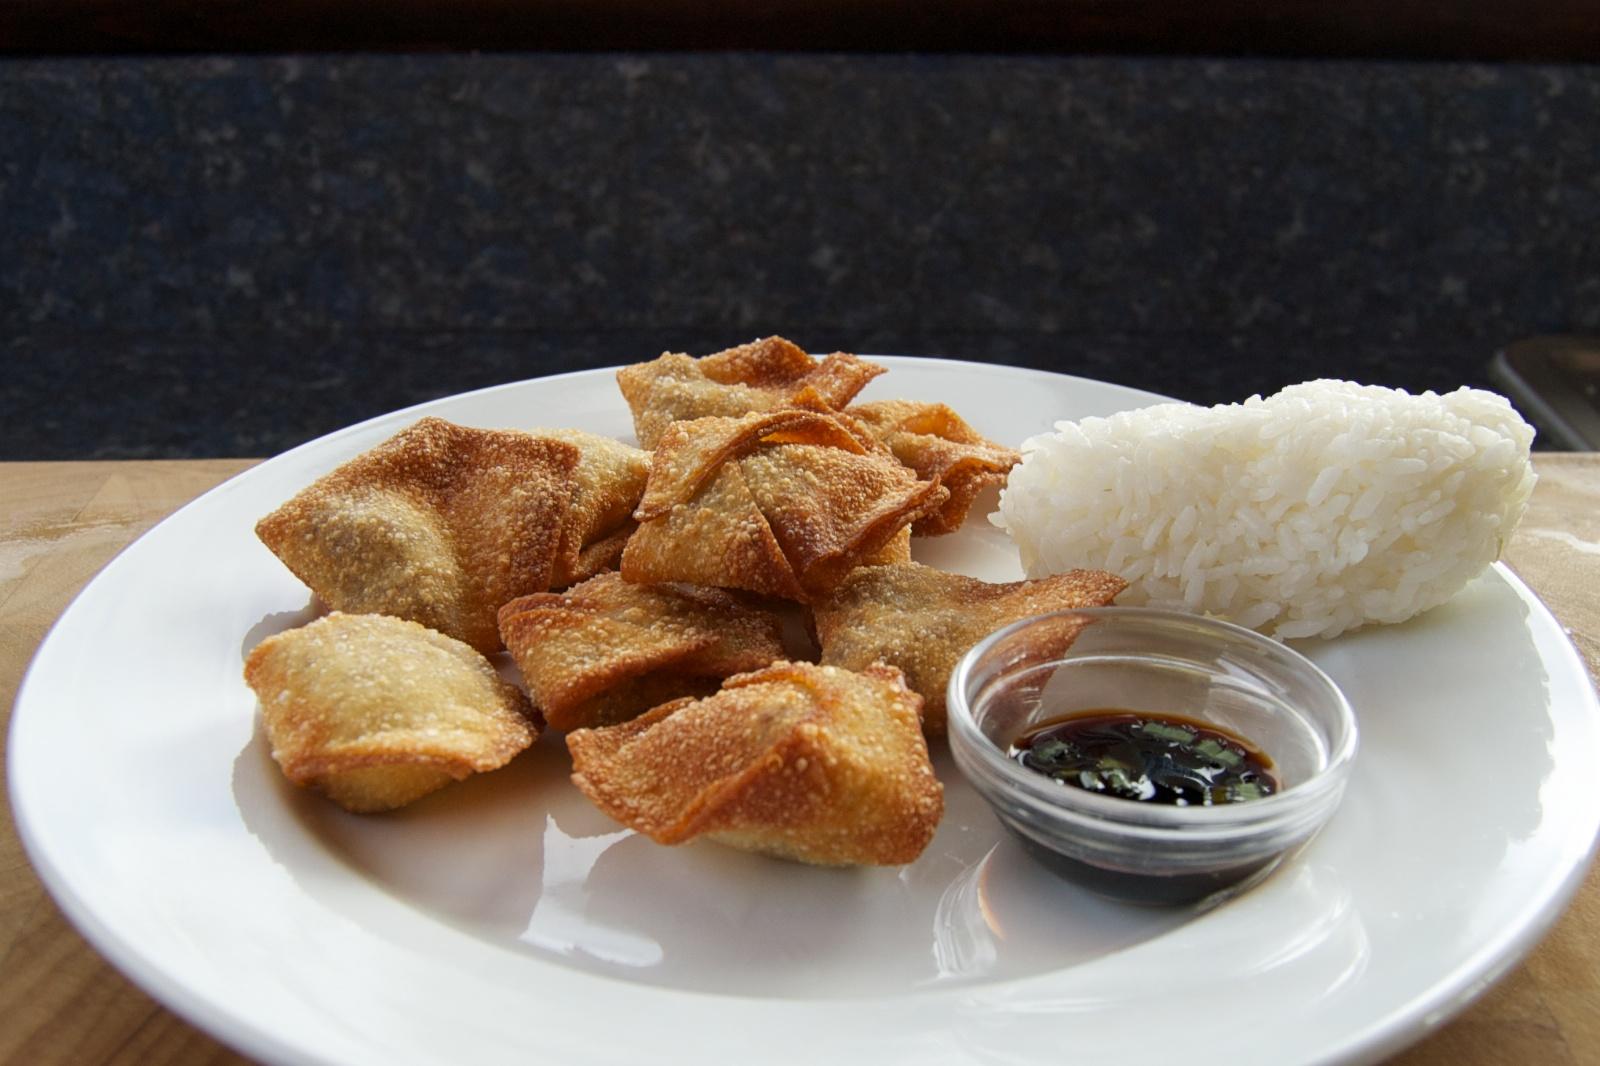 http://blog.rickk.com/food/2013/01/03/ate.2013.01.03.l.jpg